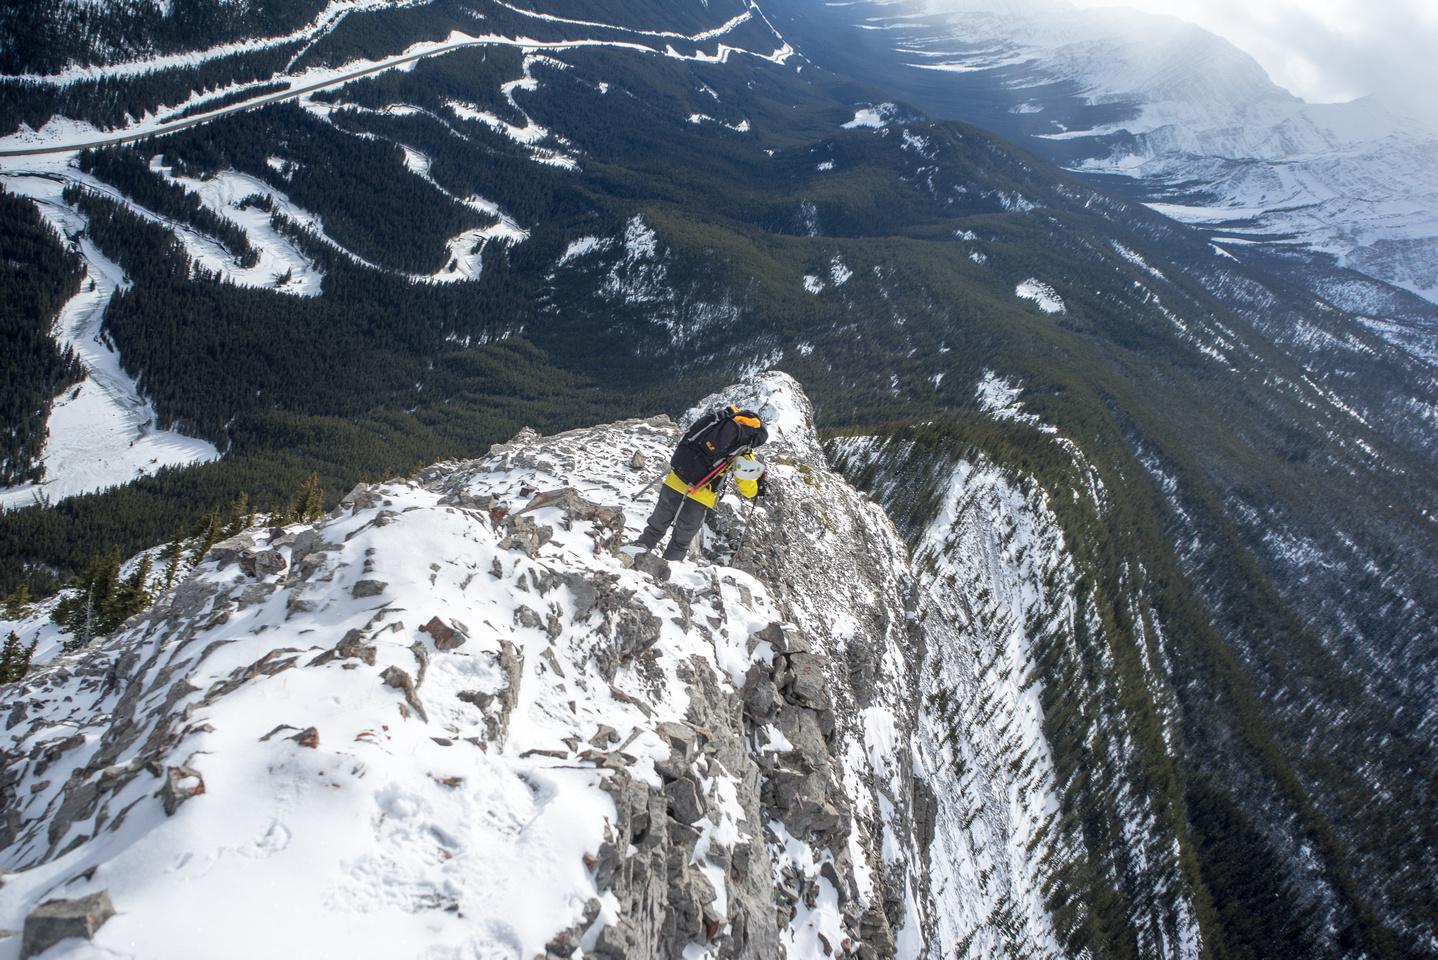 Careful down climbing.